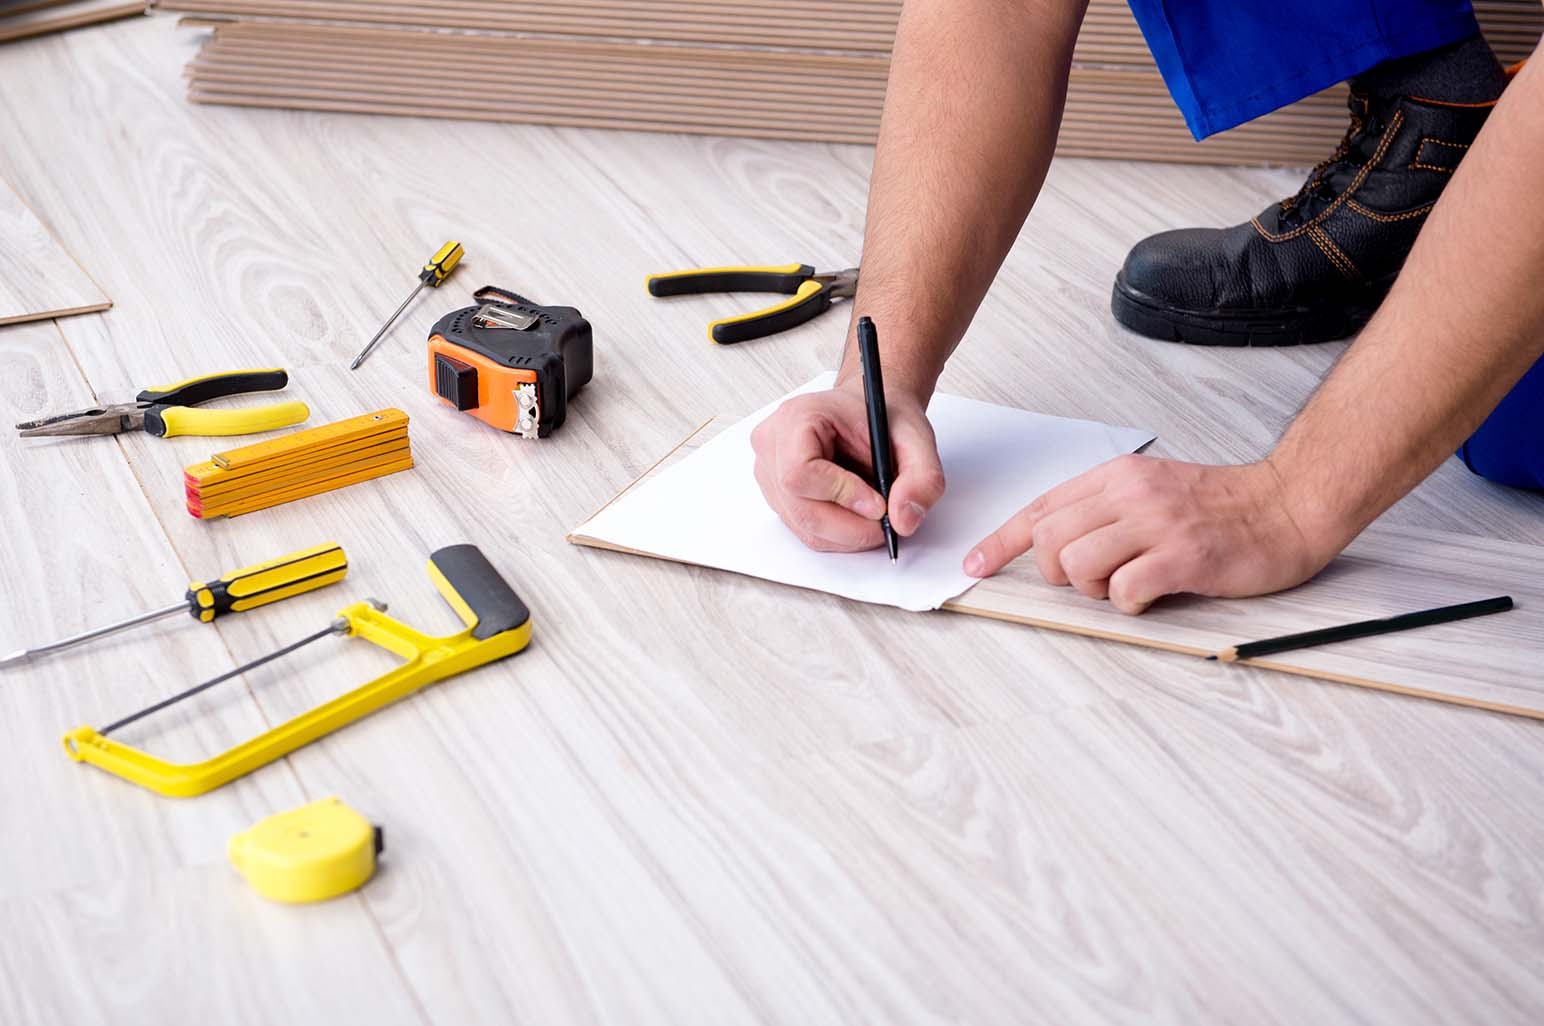 Home Renovation - Hired vs DIY